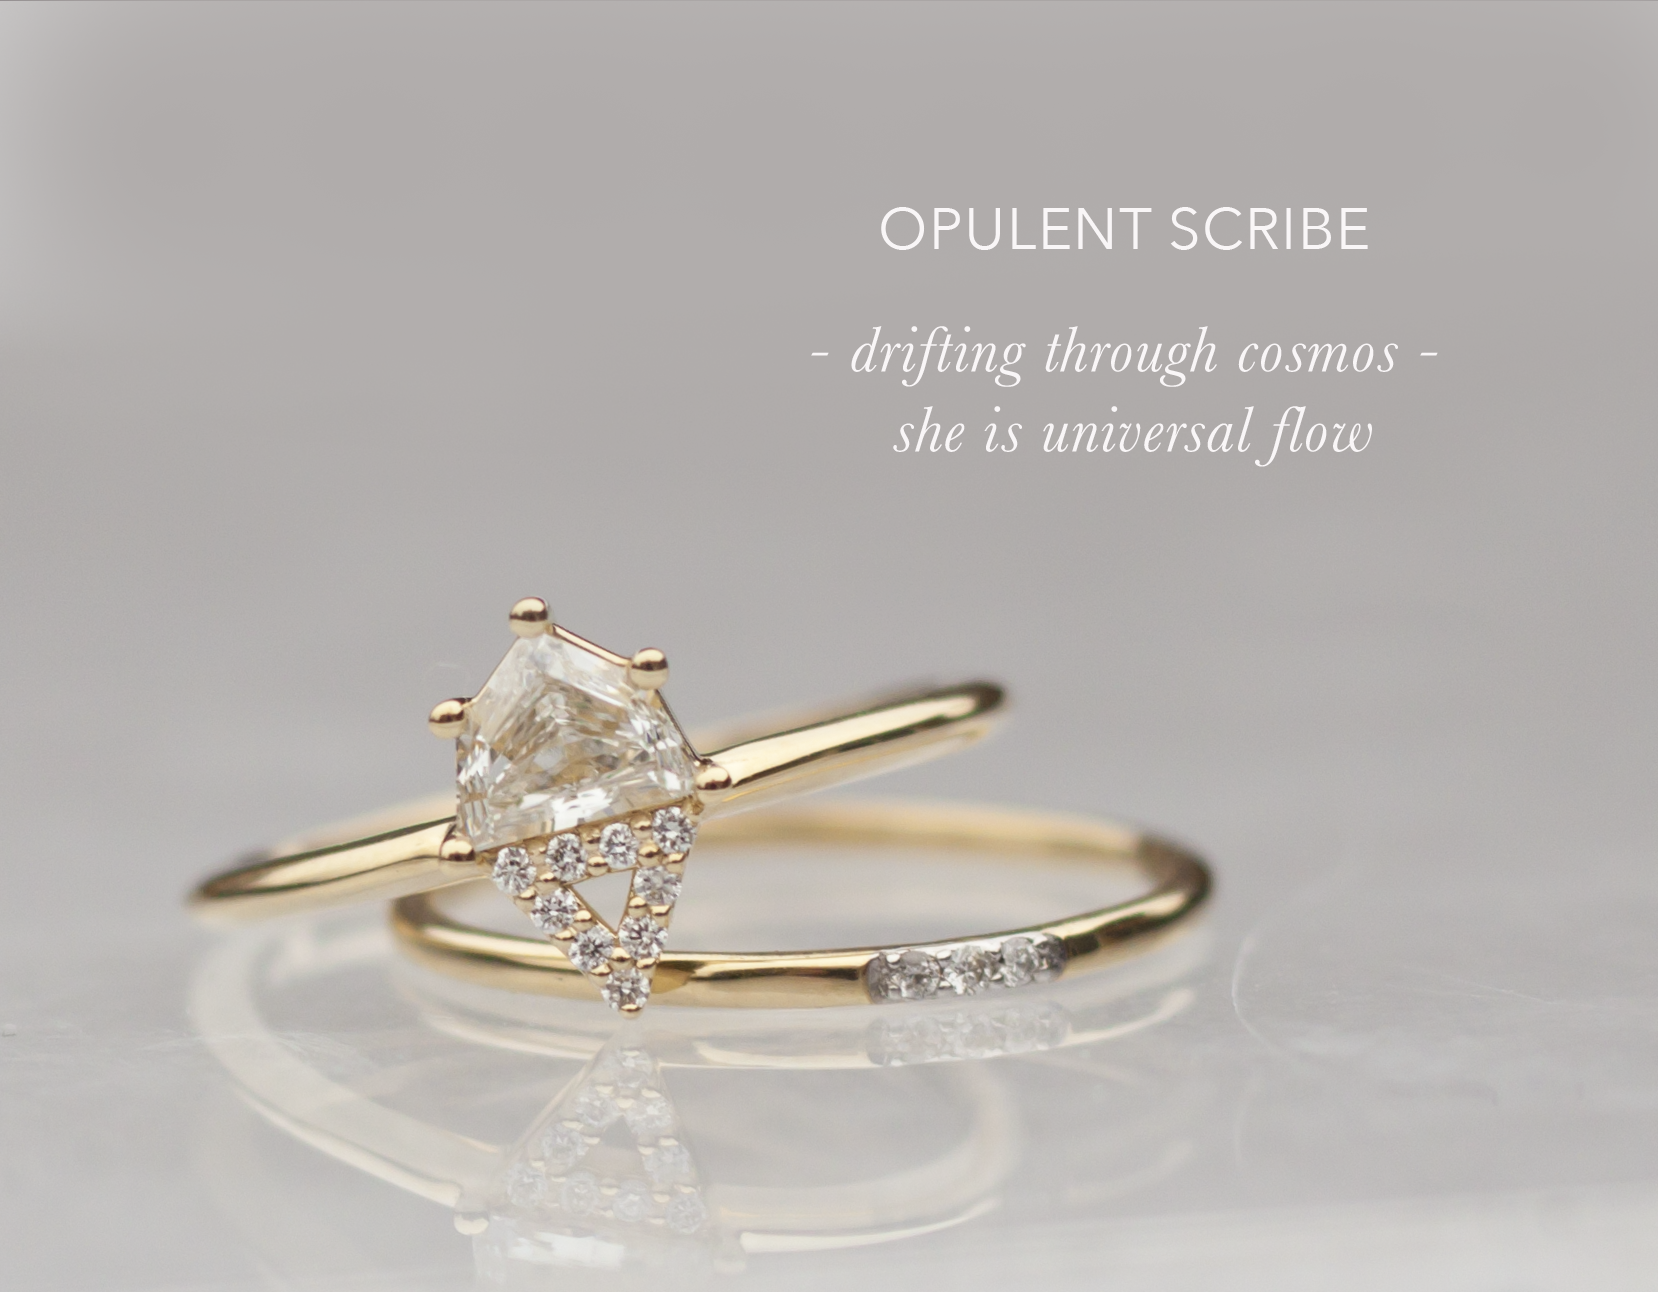 Unique Engagement Ring - Hexagon Engagement Ring - Anastassia Sel Jewelry